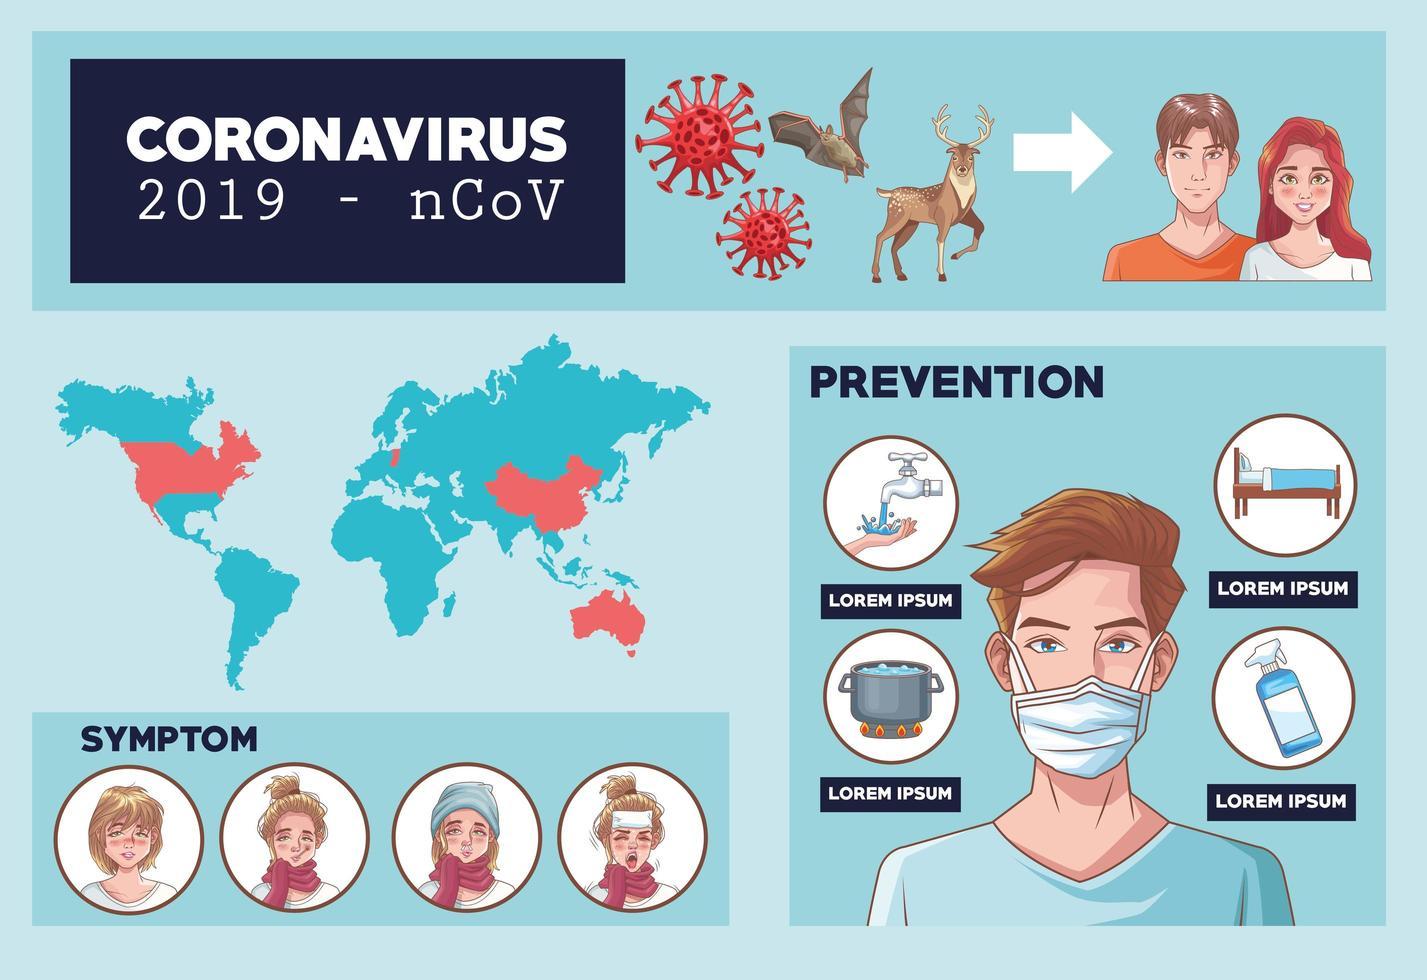 2019 ncov coronavirus infografik mit symptomen und vorbeugungen vektor